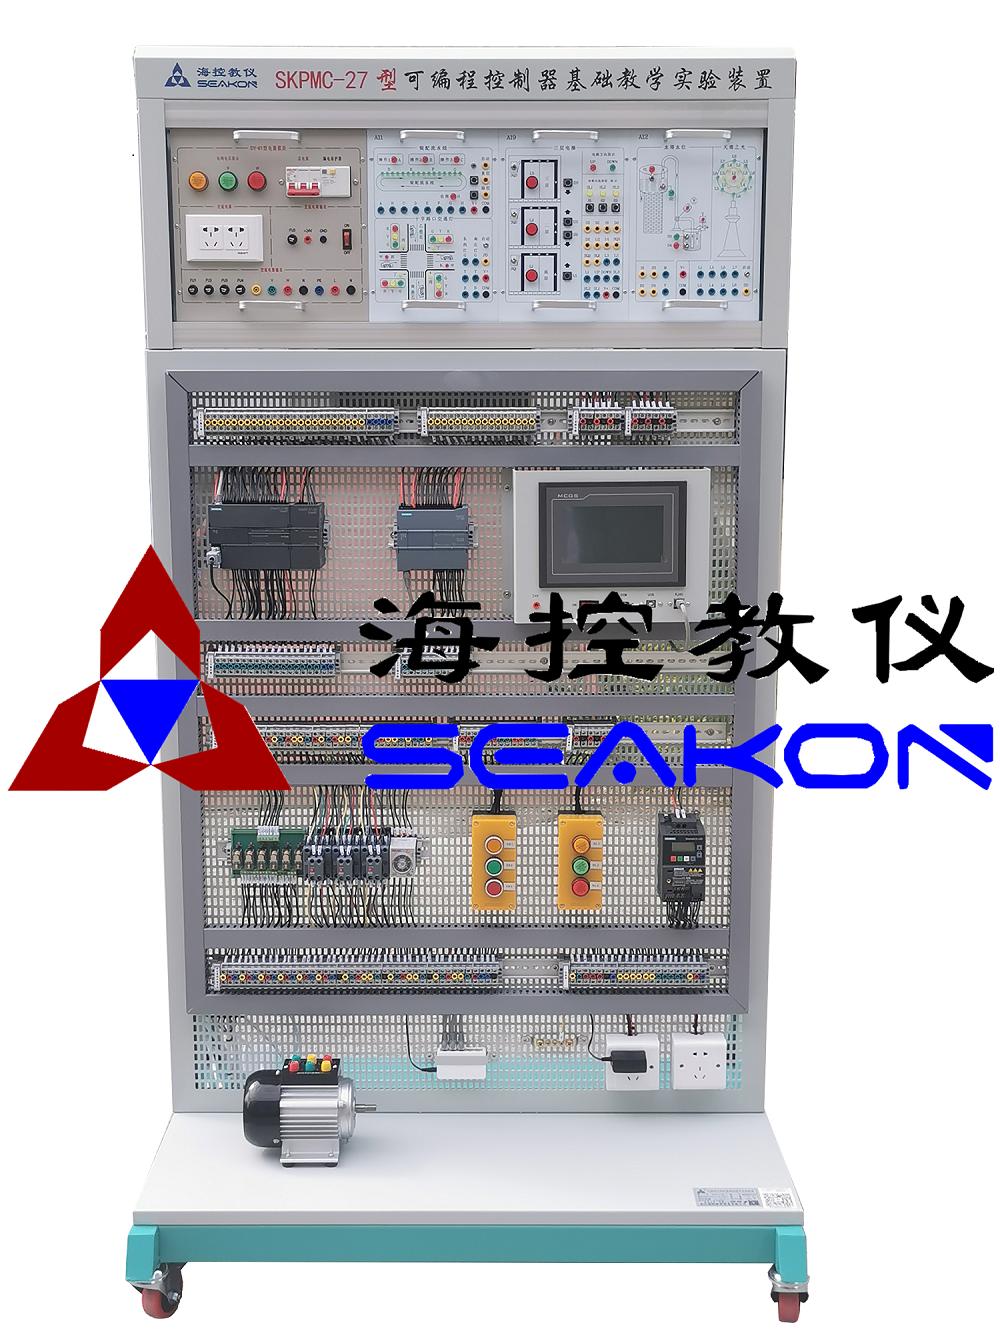 SKPMC-27型 可编程控制器基础教学试